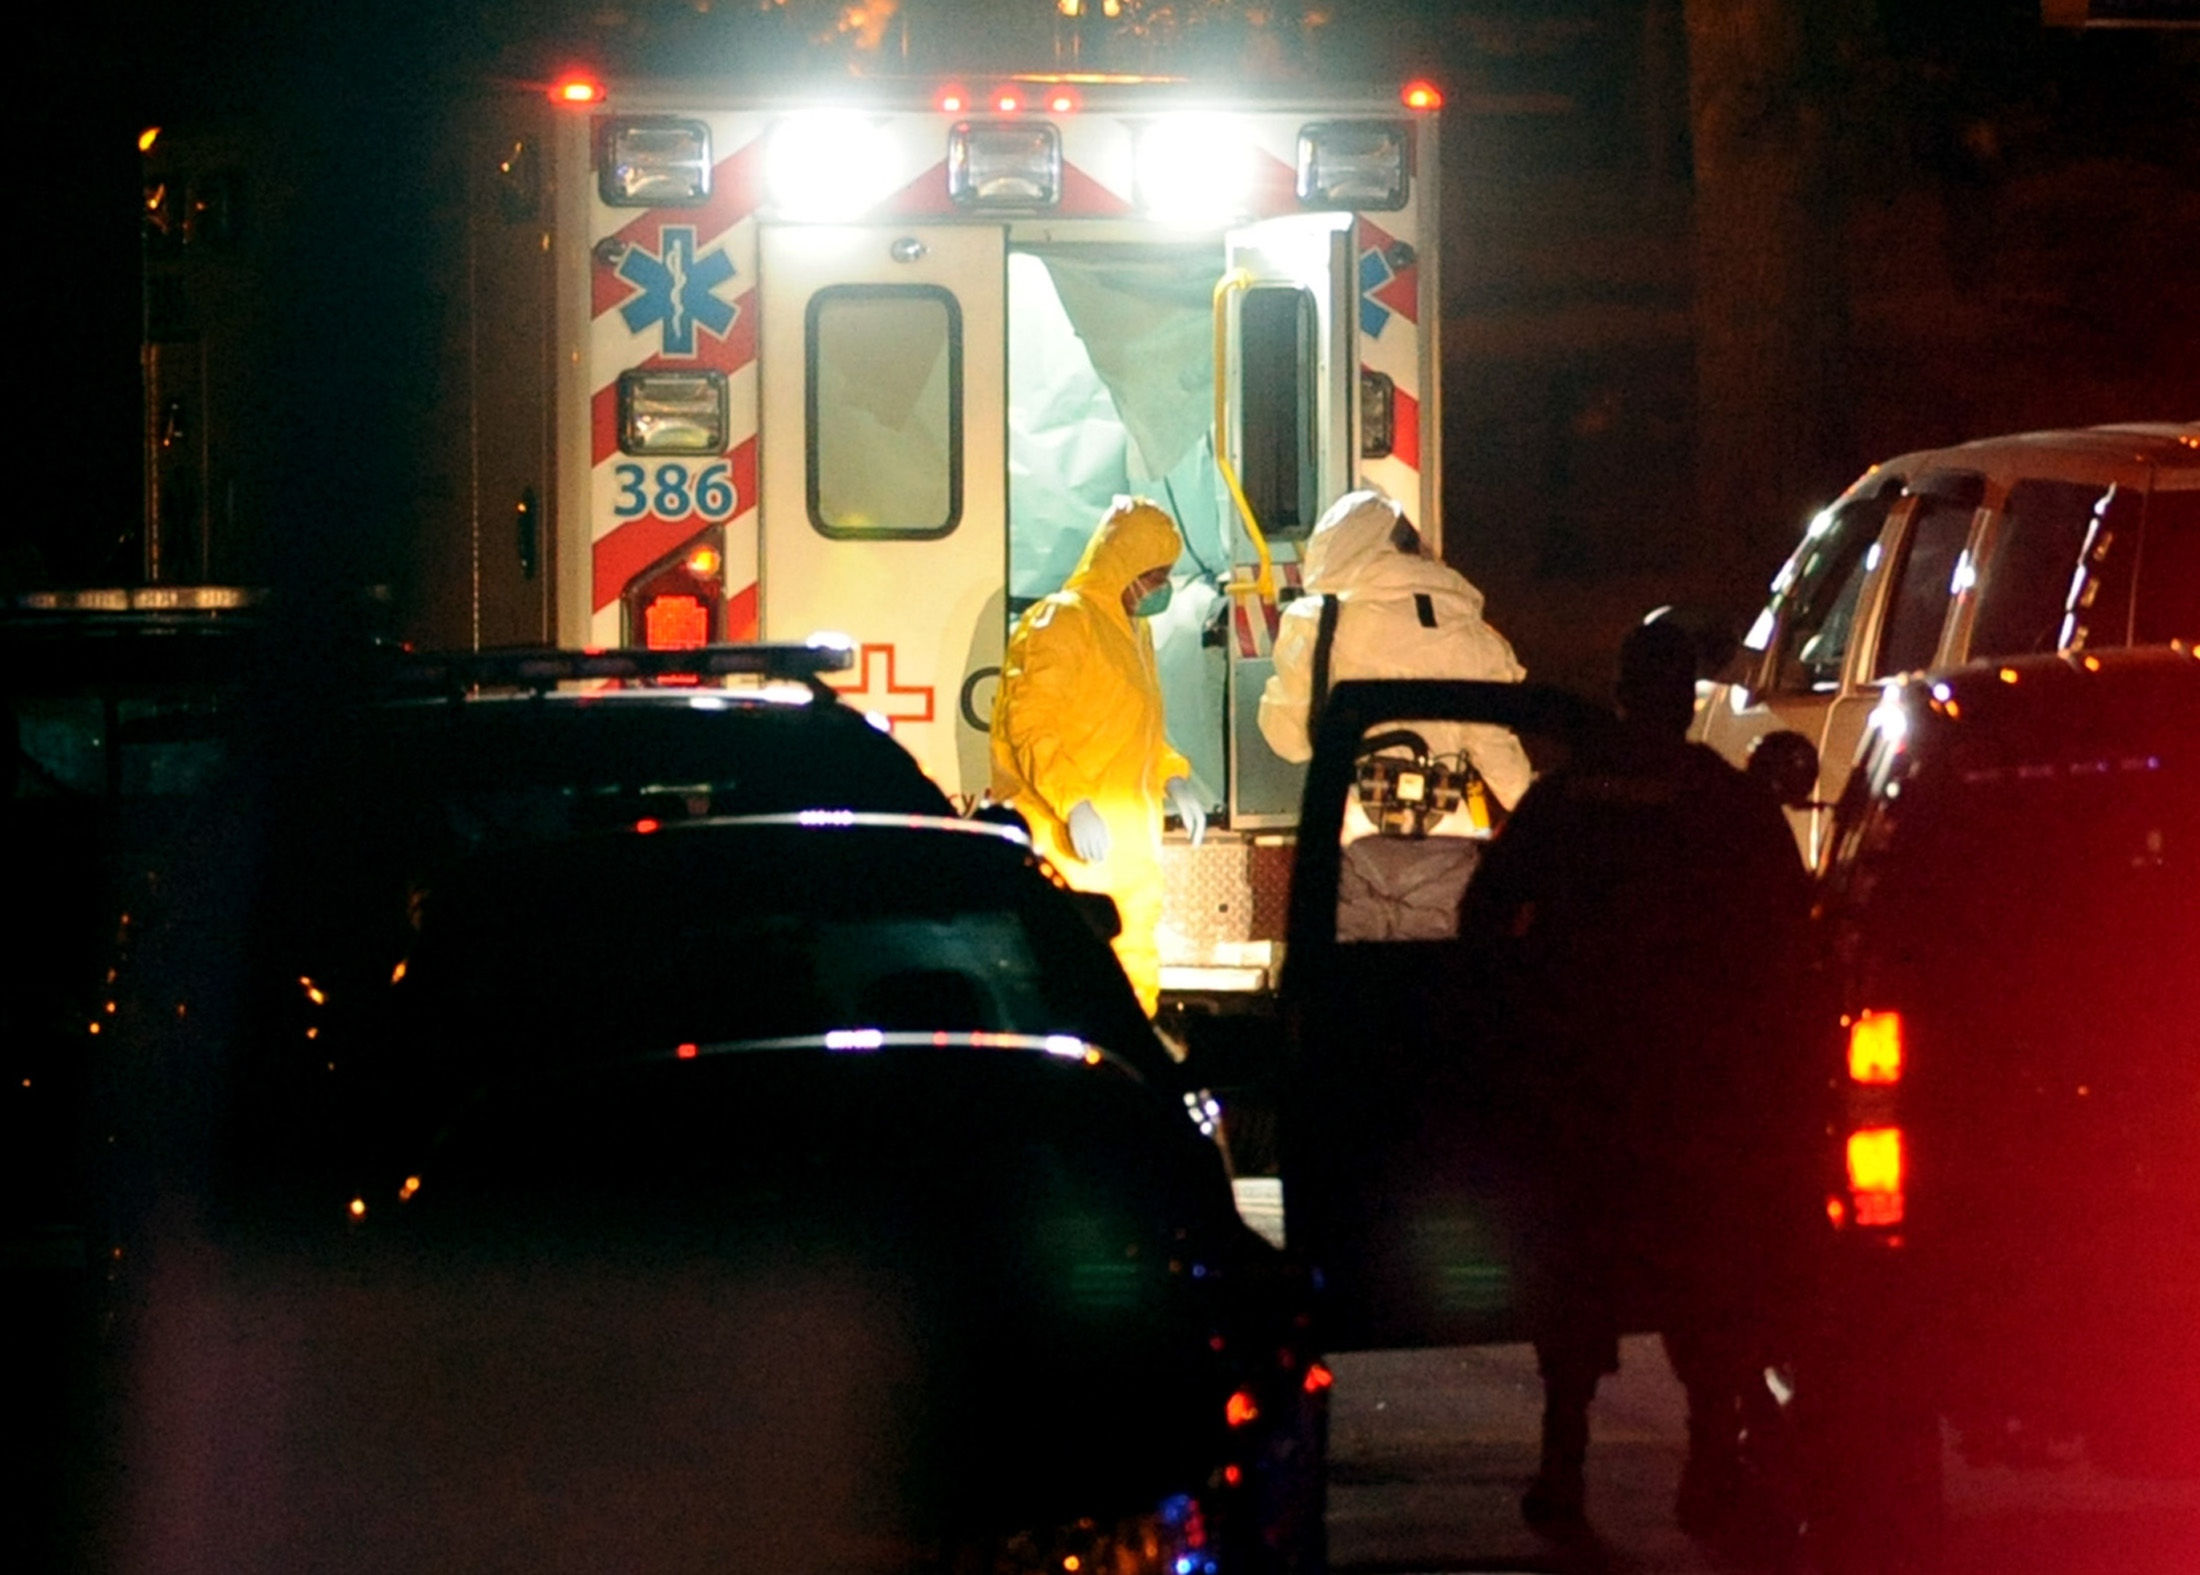 Texas nurse Amber Vinson, left, steps from an ambulance at Emory University Hospital in Atlanta, Ga., on Oct. 15, 2014.